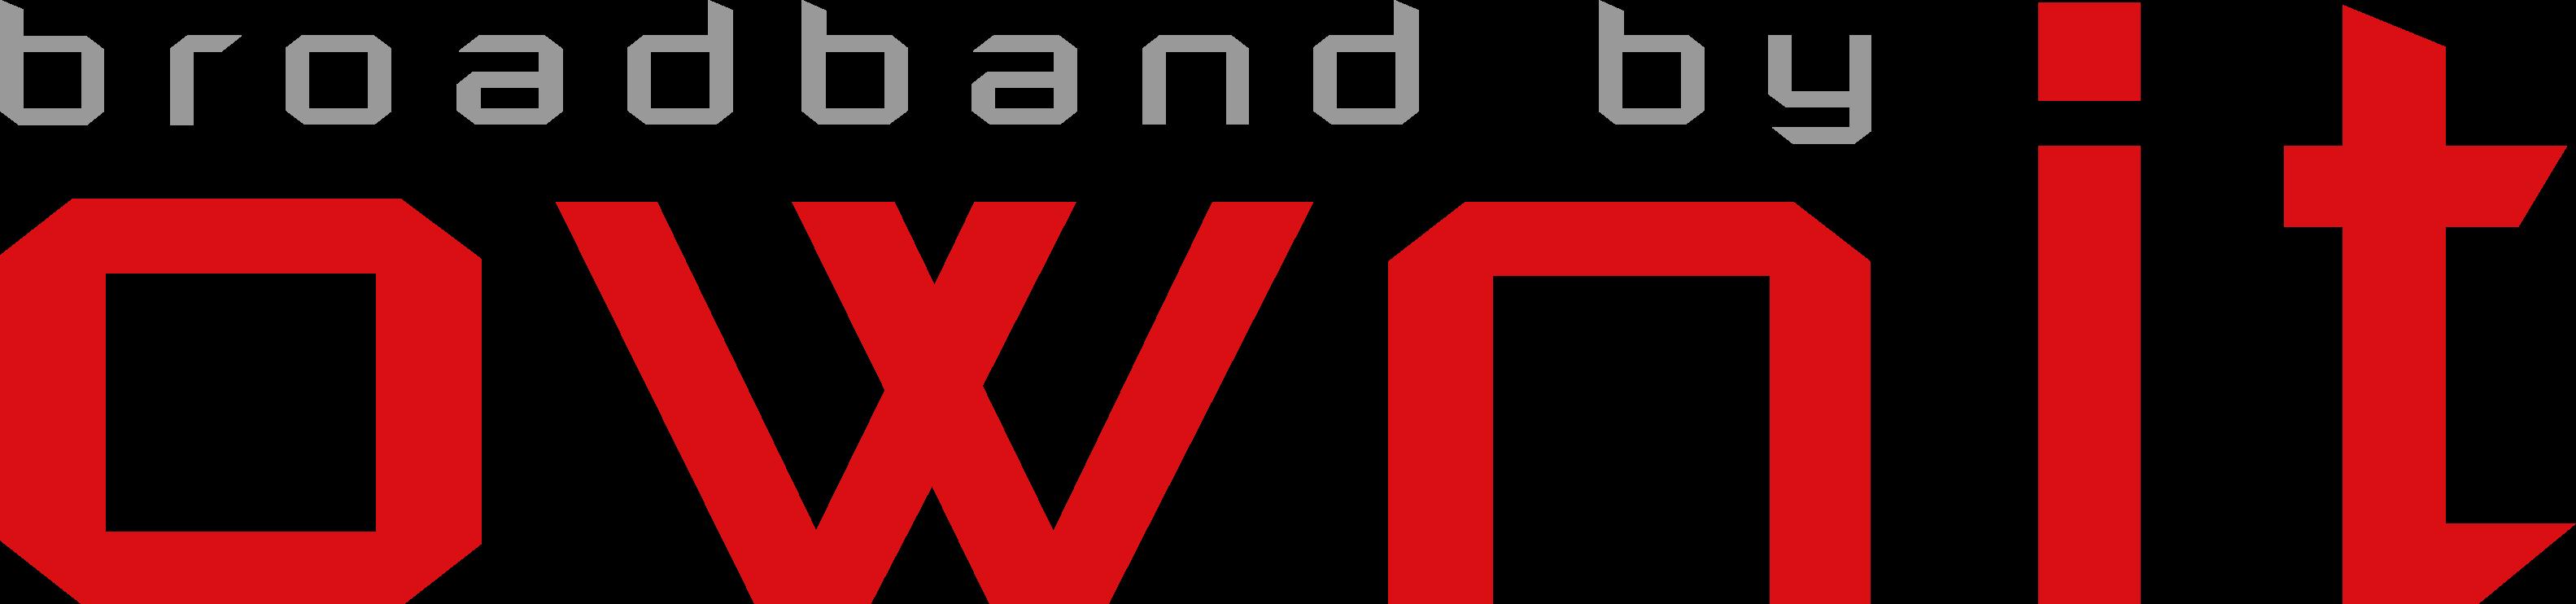 Ownit logotyp